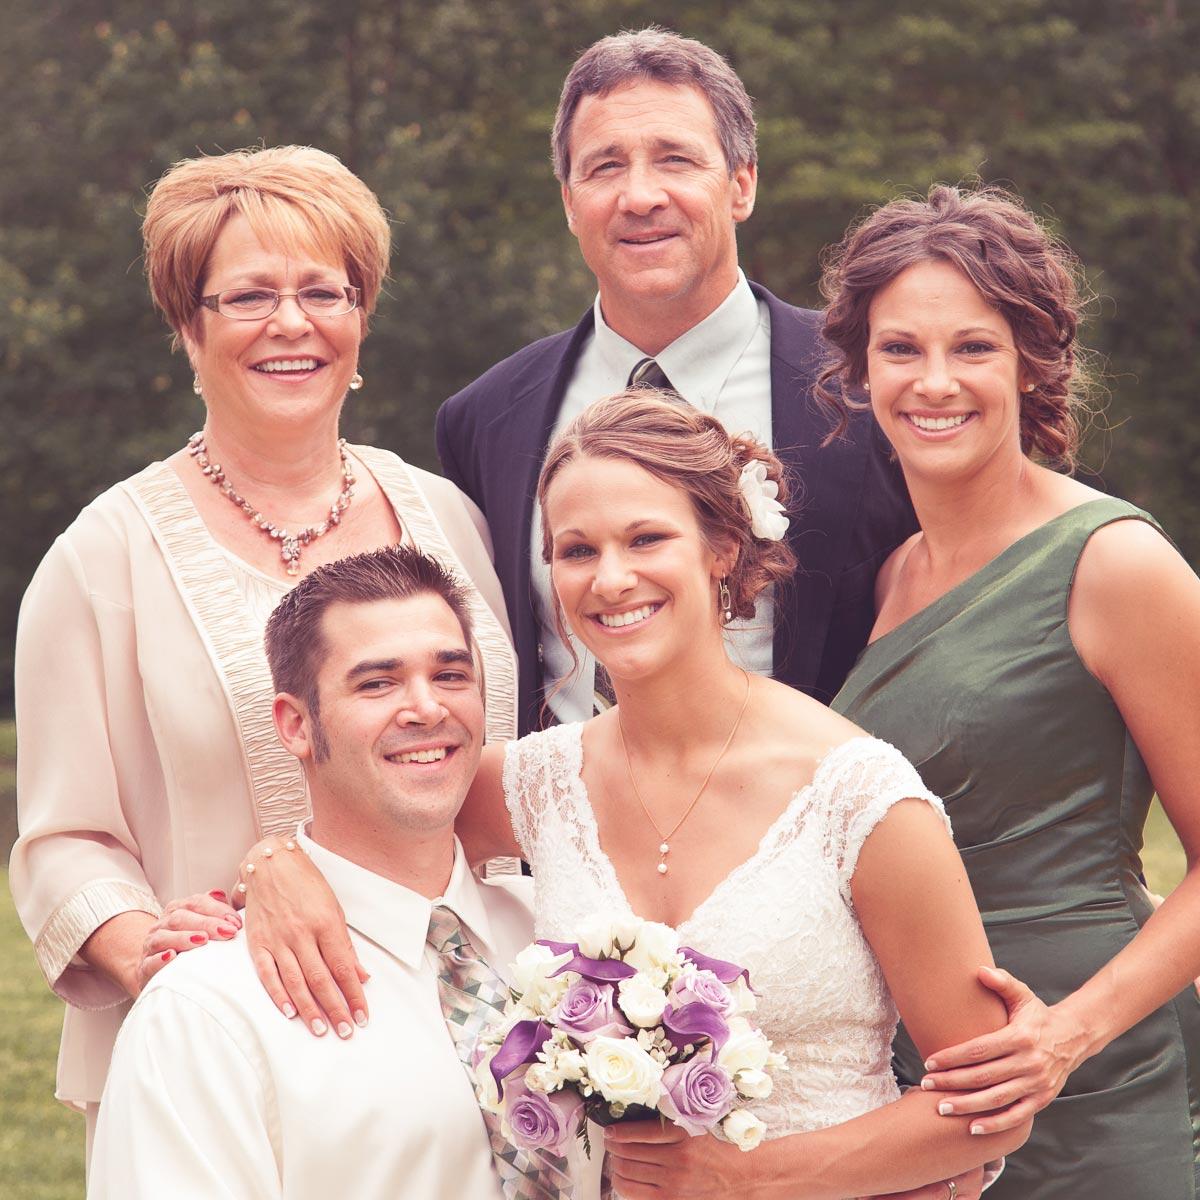 evansville-wedding-photographer-pabst-photo-kokies-echo-valley-(52)